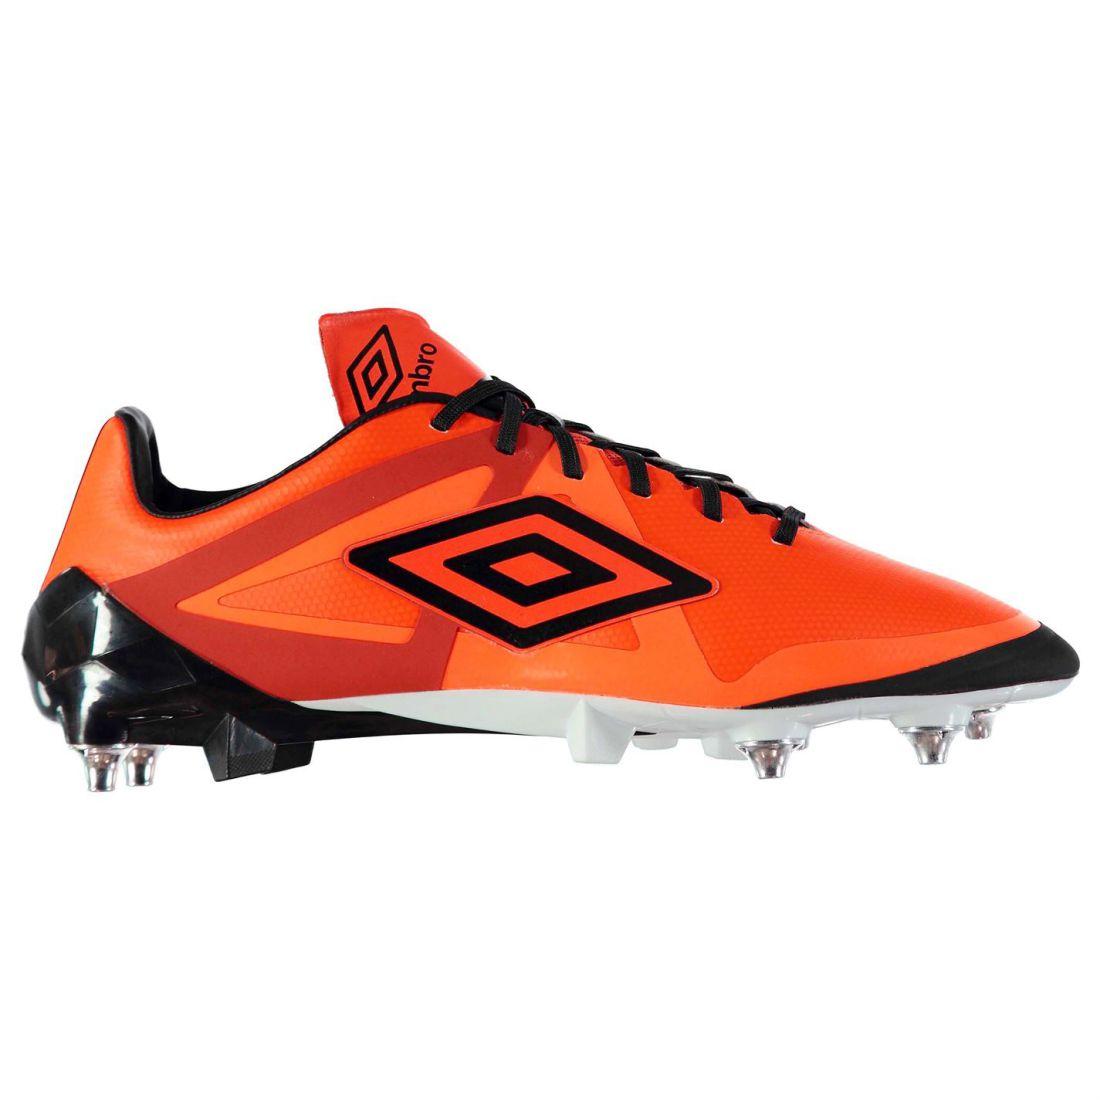 Umbro Mens Velocita Pro SG Football Boots Shoes Lace Up Synthetic ... 270d1606e0d4e